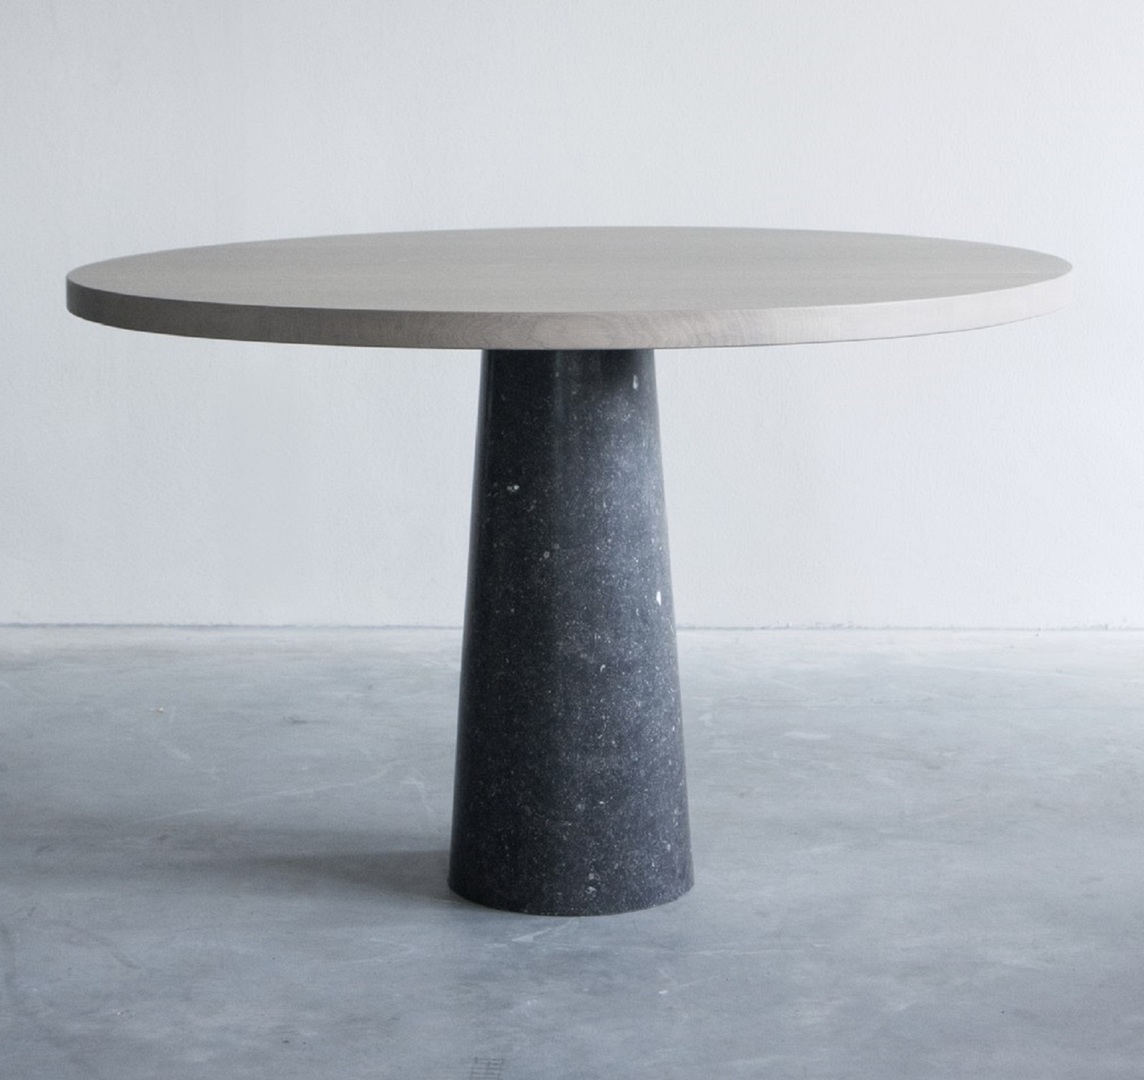 Stone table with Belgian blue limestone (1) groot.jpg